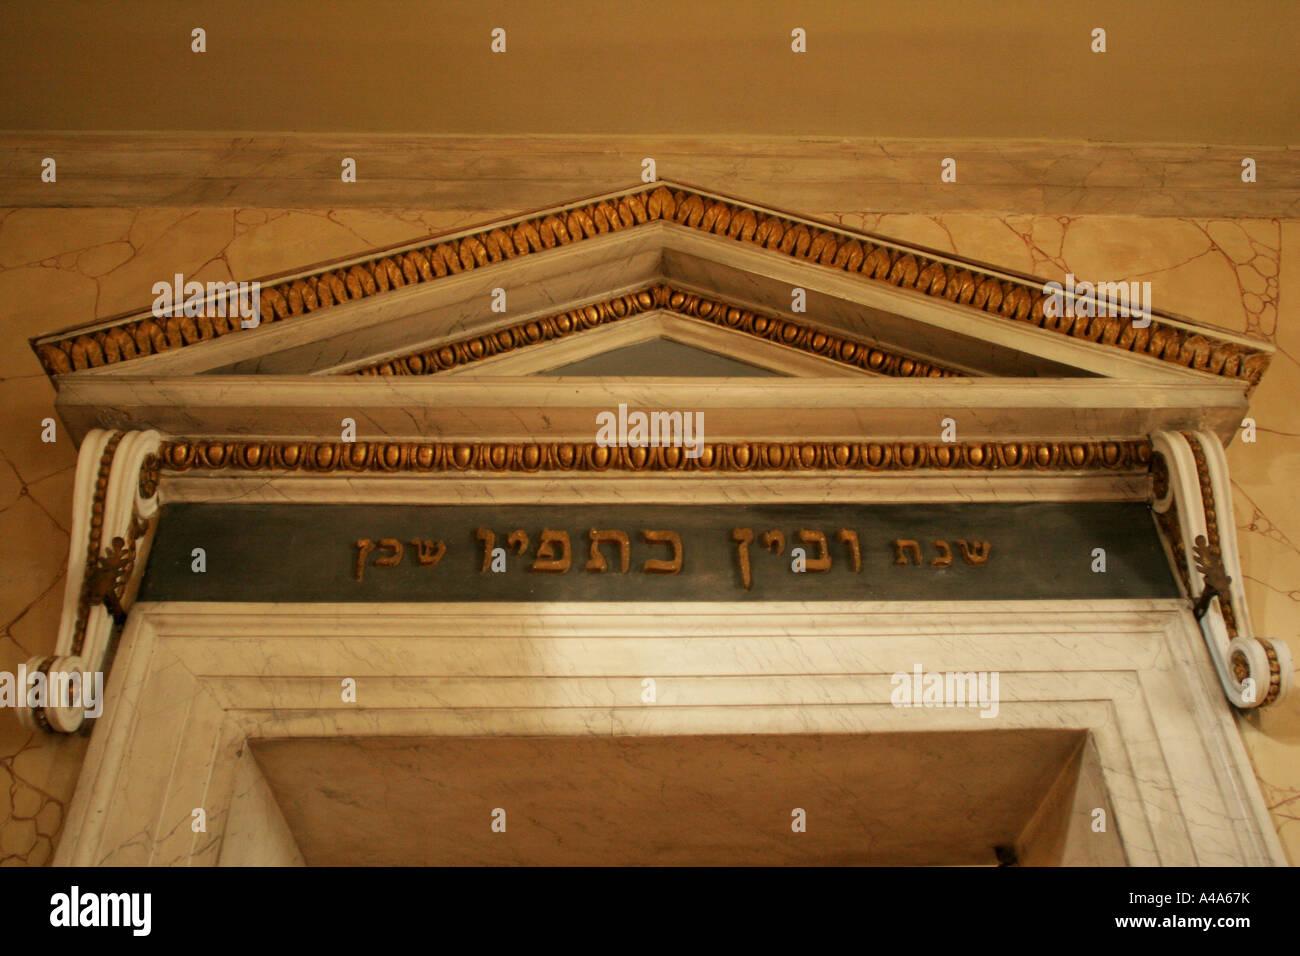 Inscription Synagogue 1824 by Carlo Visioli Sabbioneta Lombardy Italy - Stock Image